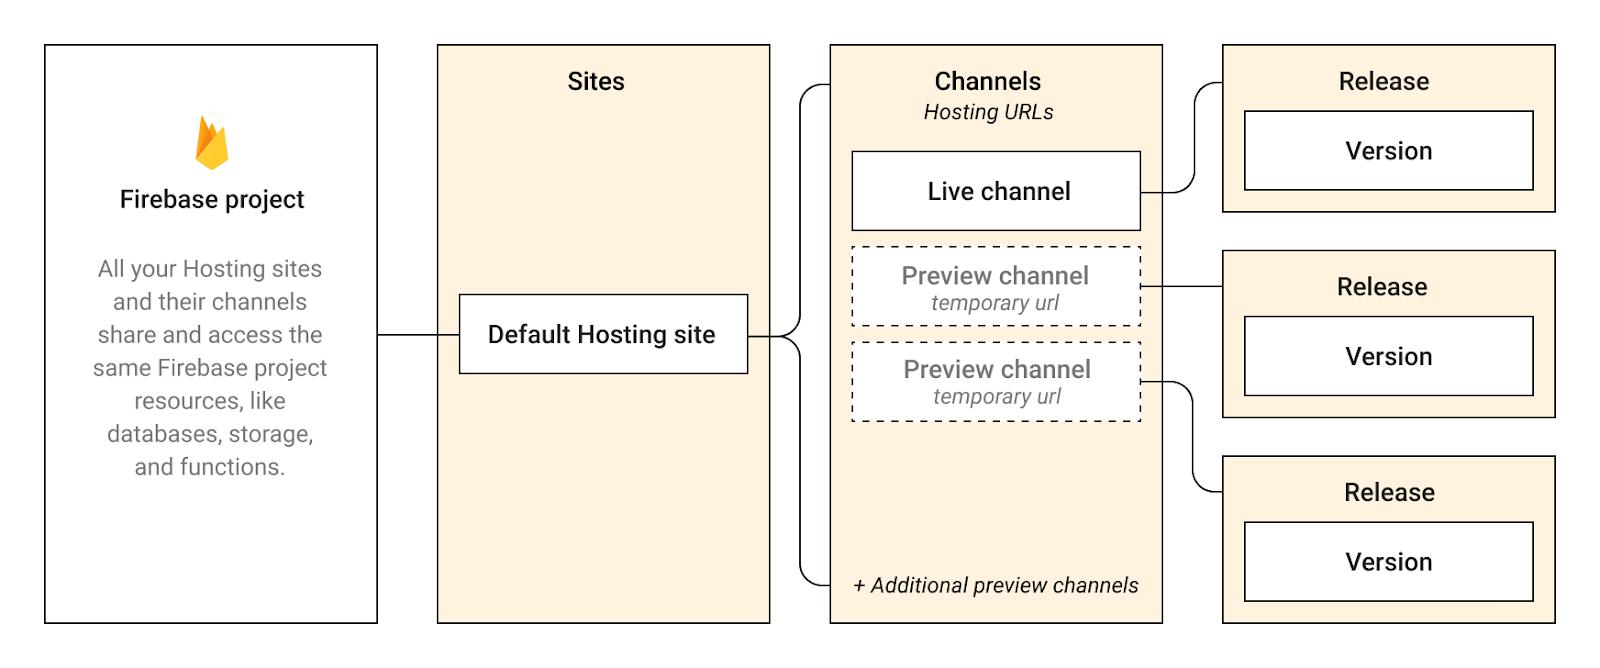 Firebase 호스팅 계층 구조의 이미지